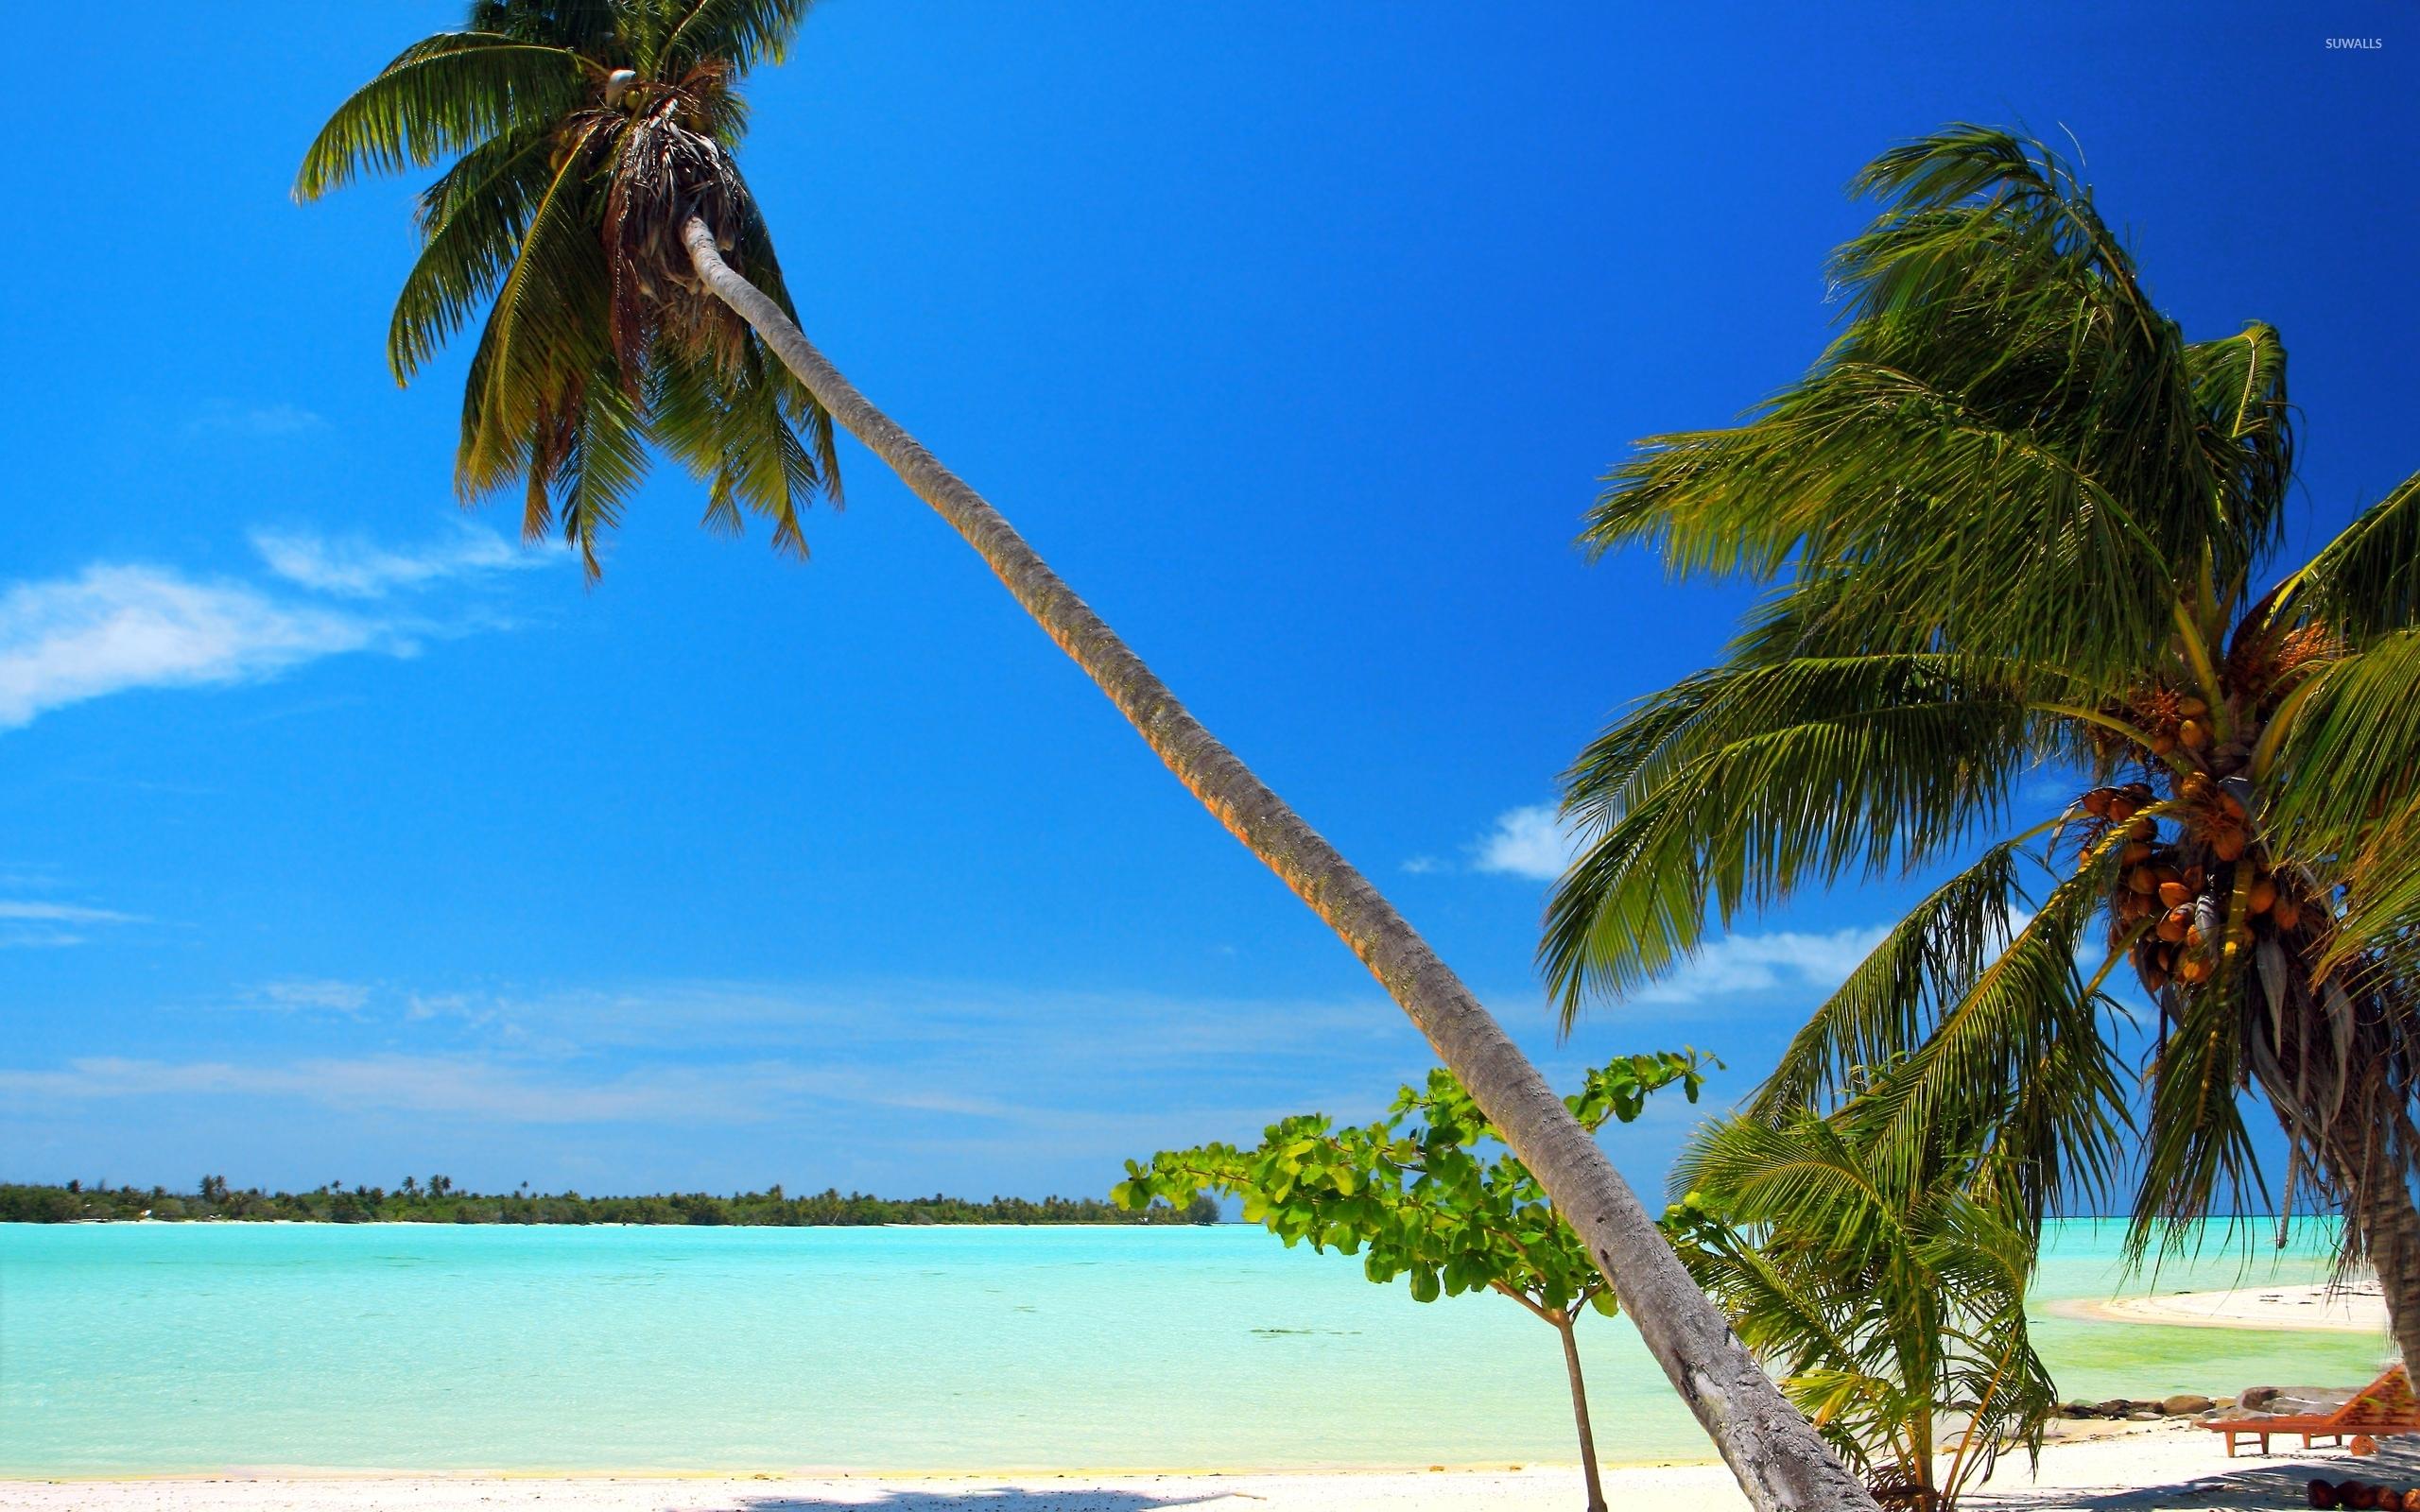 Palm trees on sandy beach wallpaper - Beach wallpapers ...